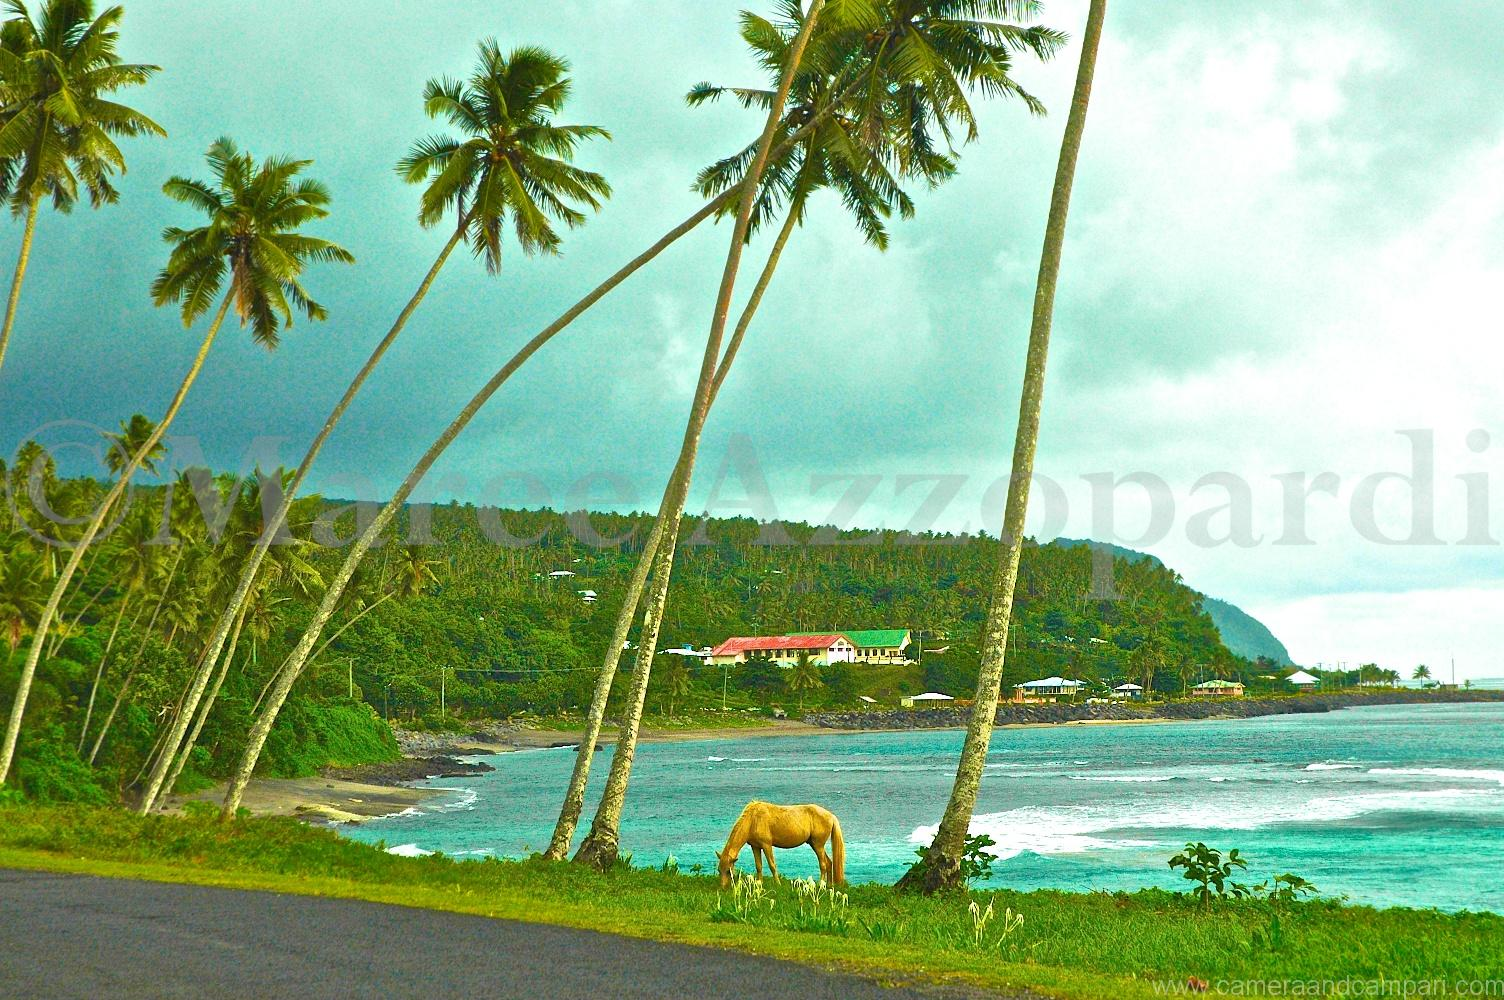 Samoa coastline with palm trees and pony